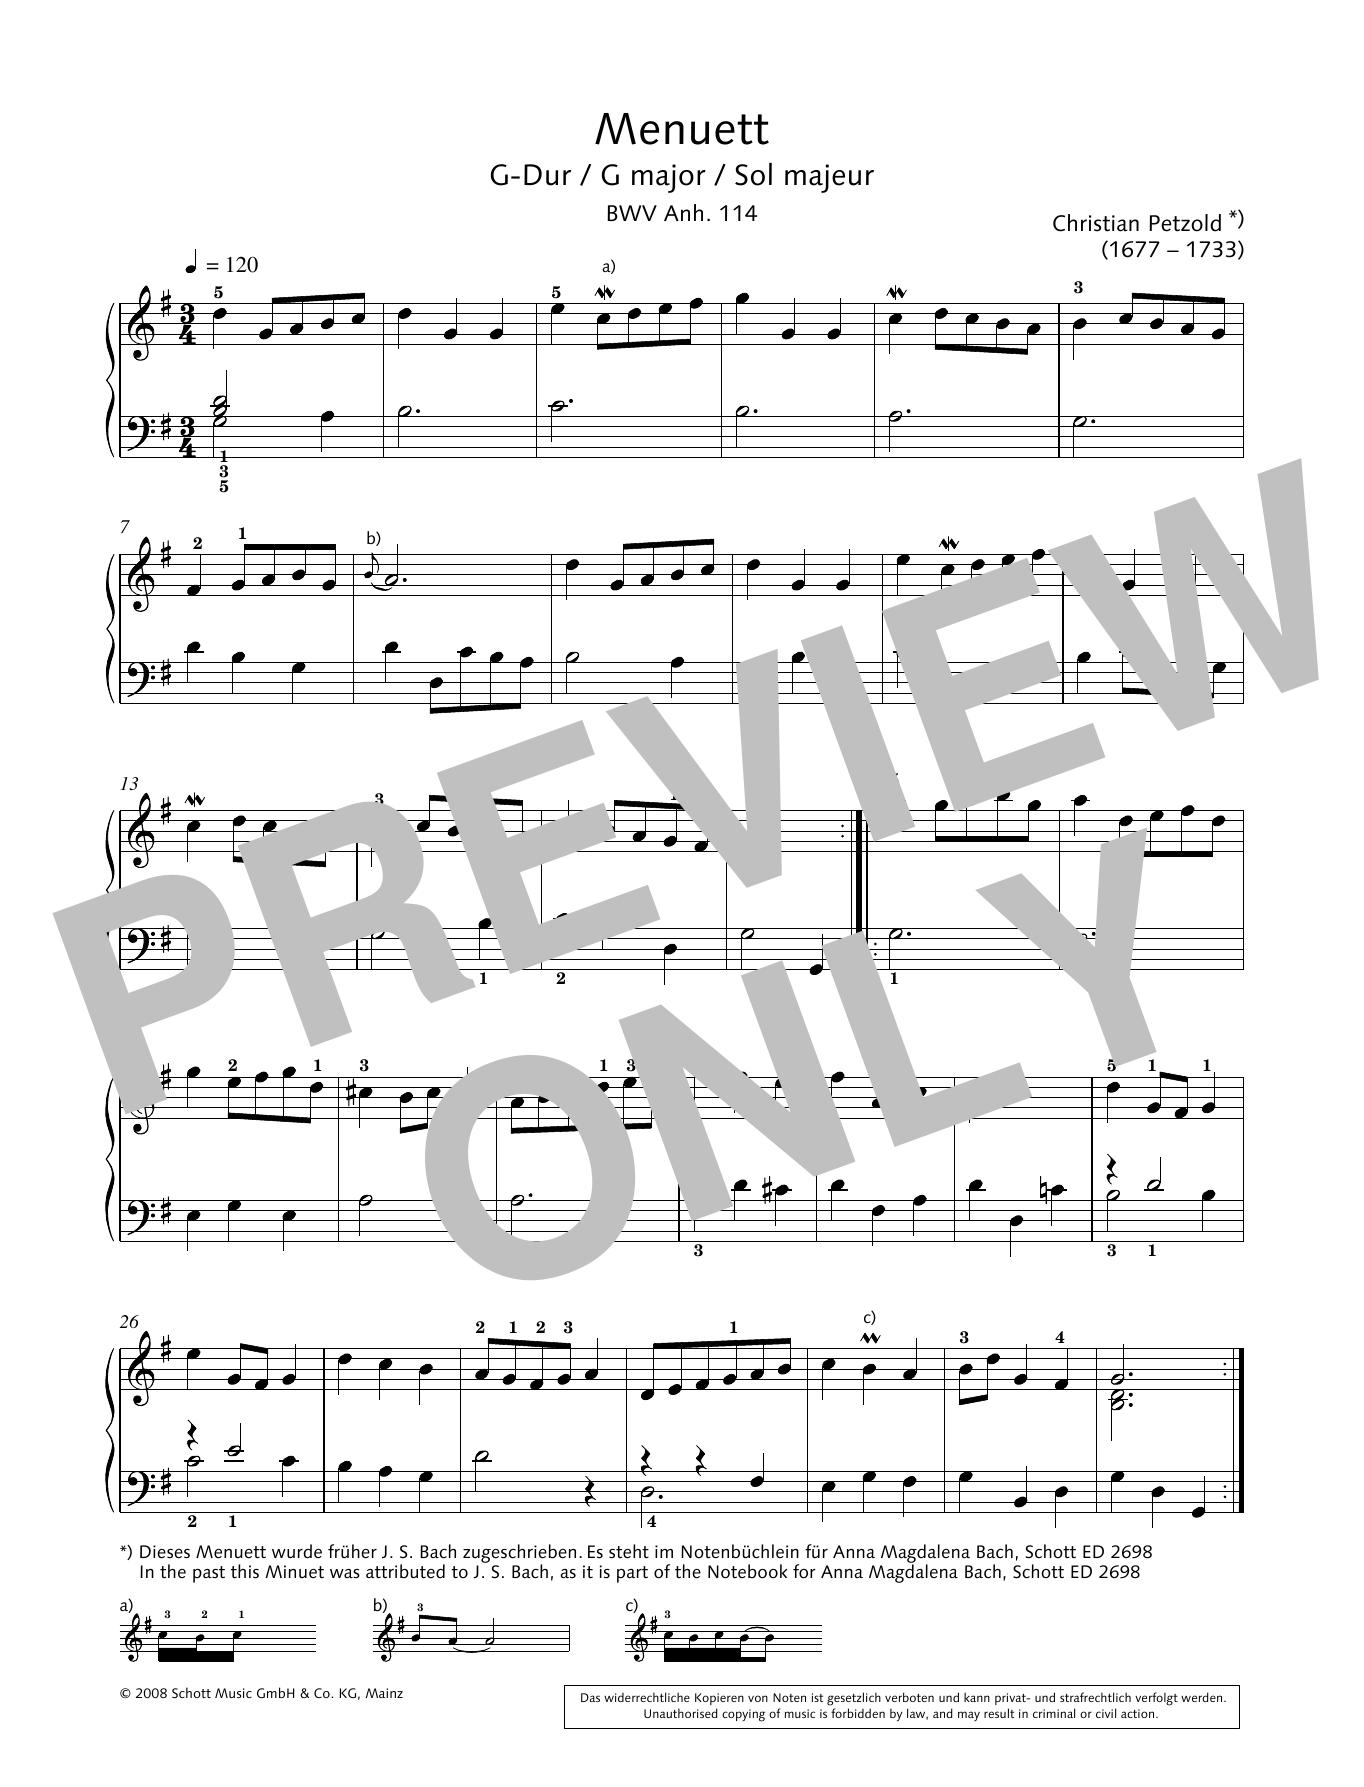 Minuet in G major, BWV Anh. 114 Sheet Music